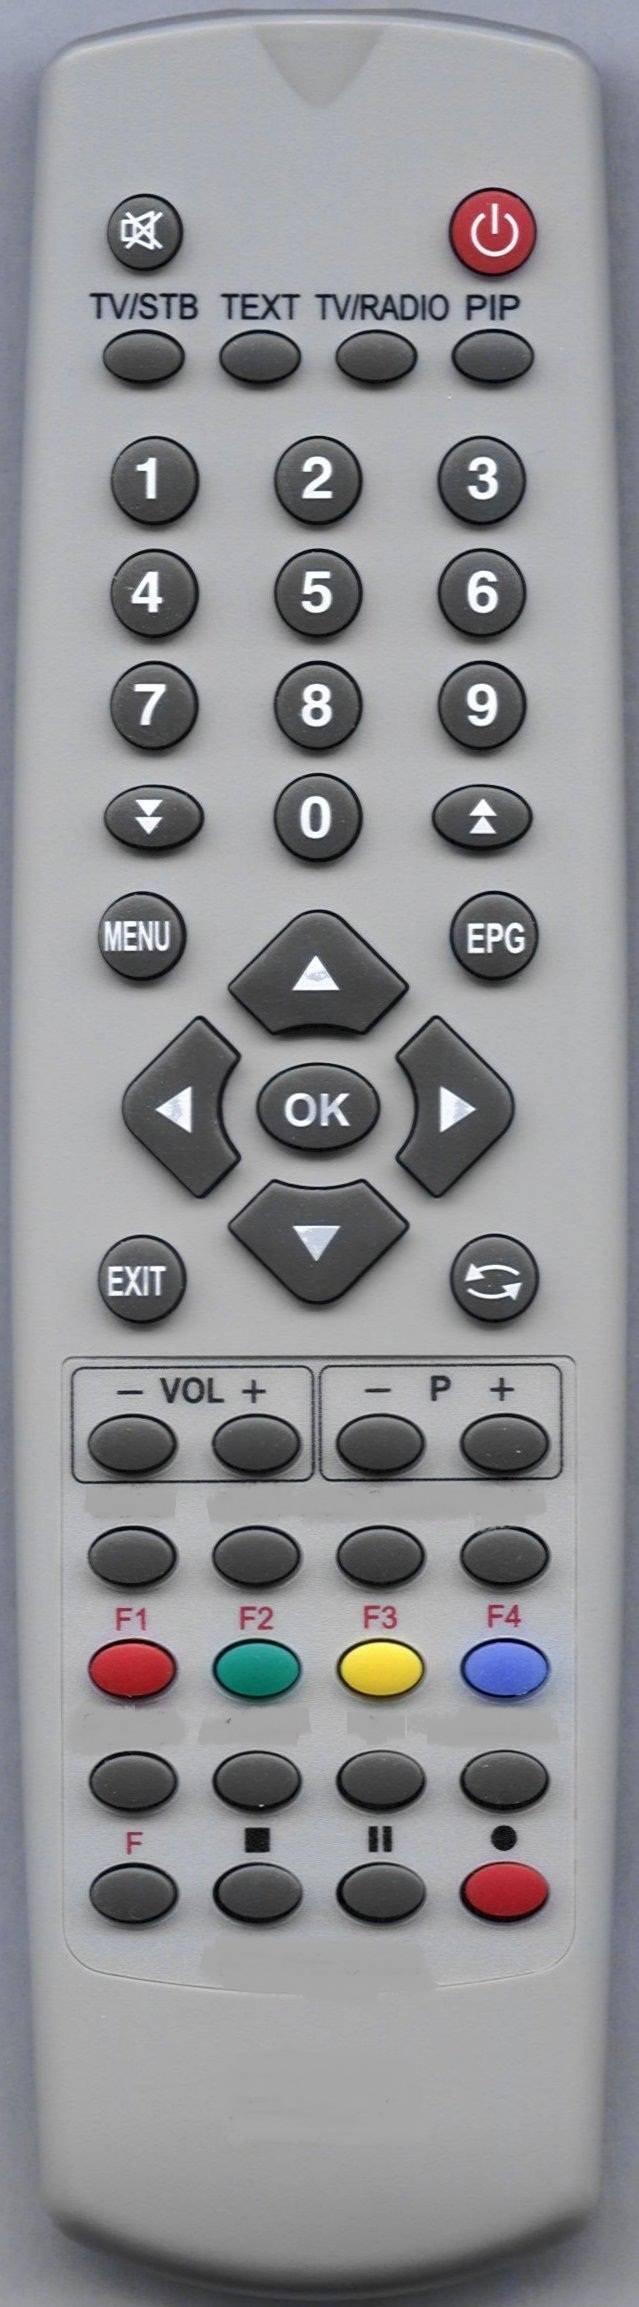 SCHNEIDER vut 561 STV561 mando a distancia: Amazon.es: Electrónica